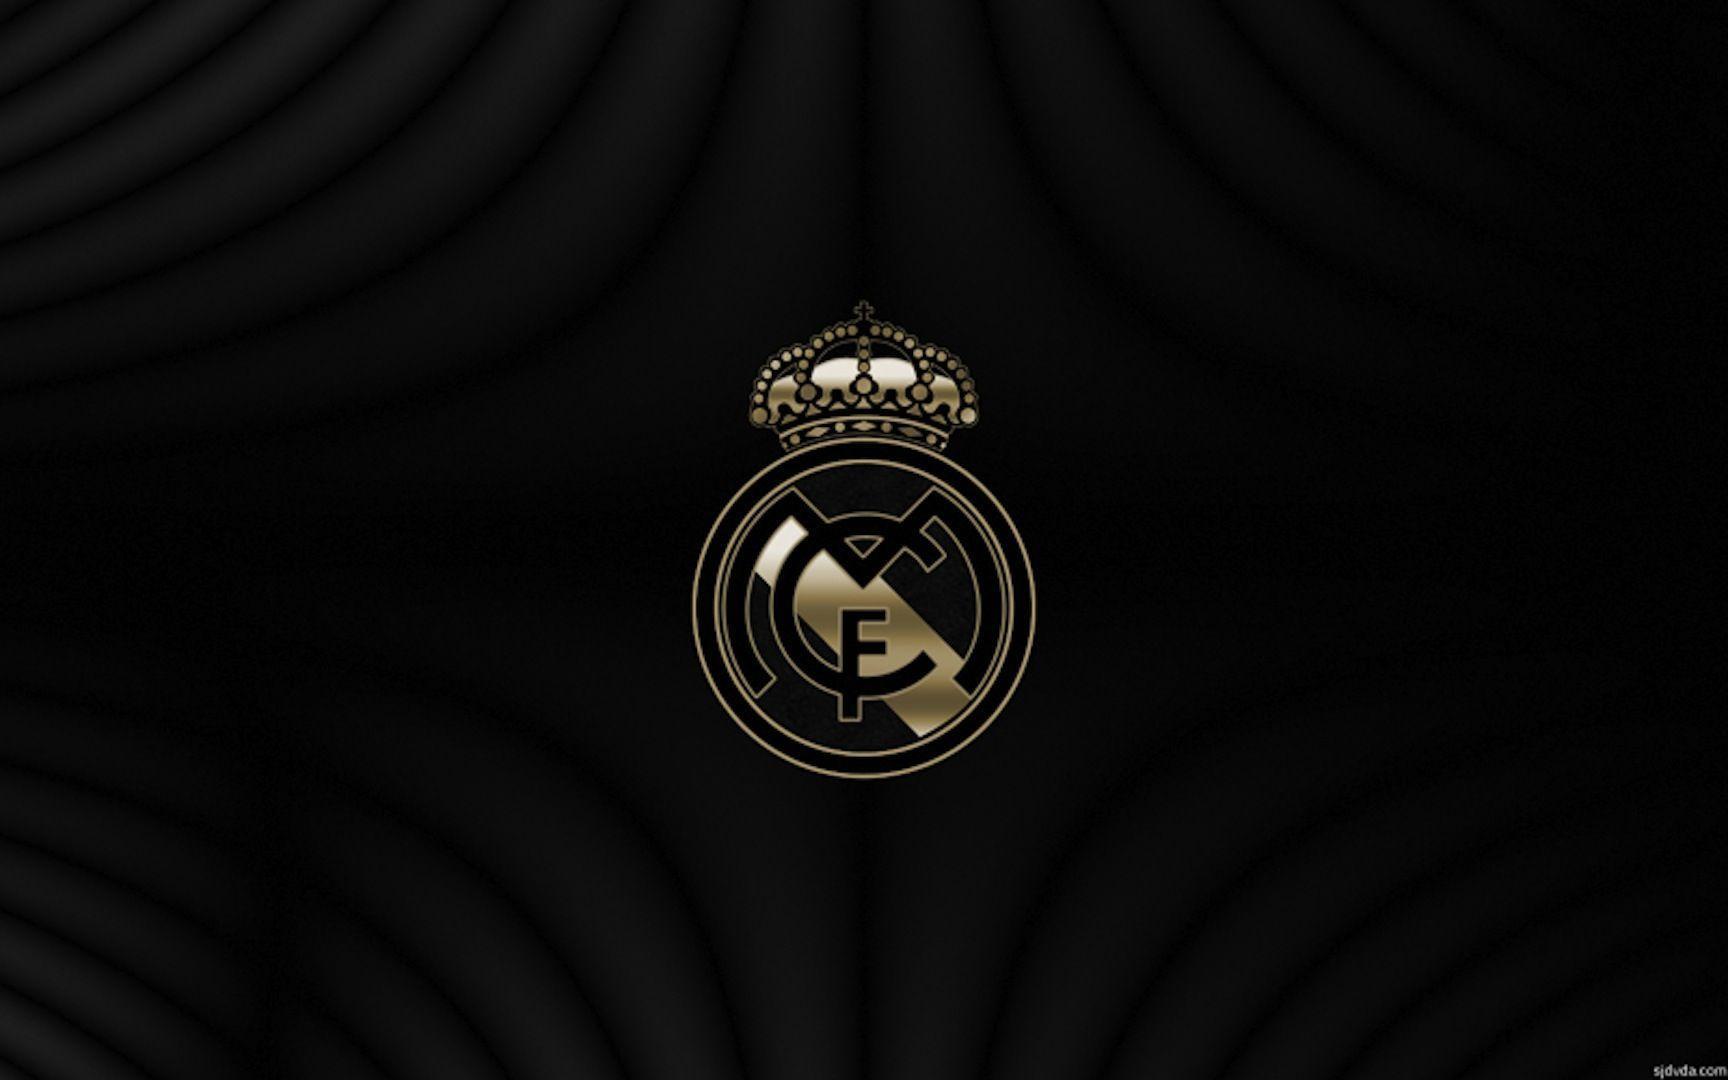 Sport Wallpaper Real Madrid: Real Madrid HD Wallpapers